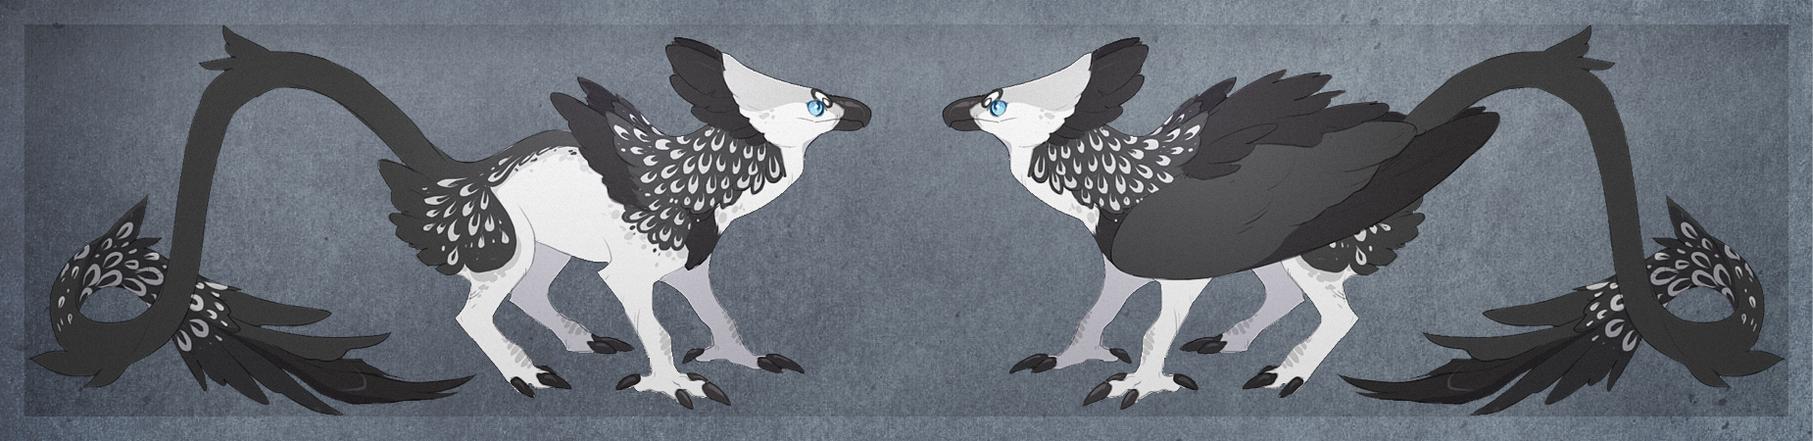 Harpy Griff by Sheylu